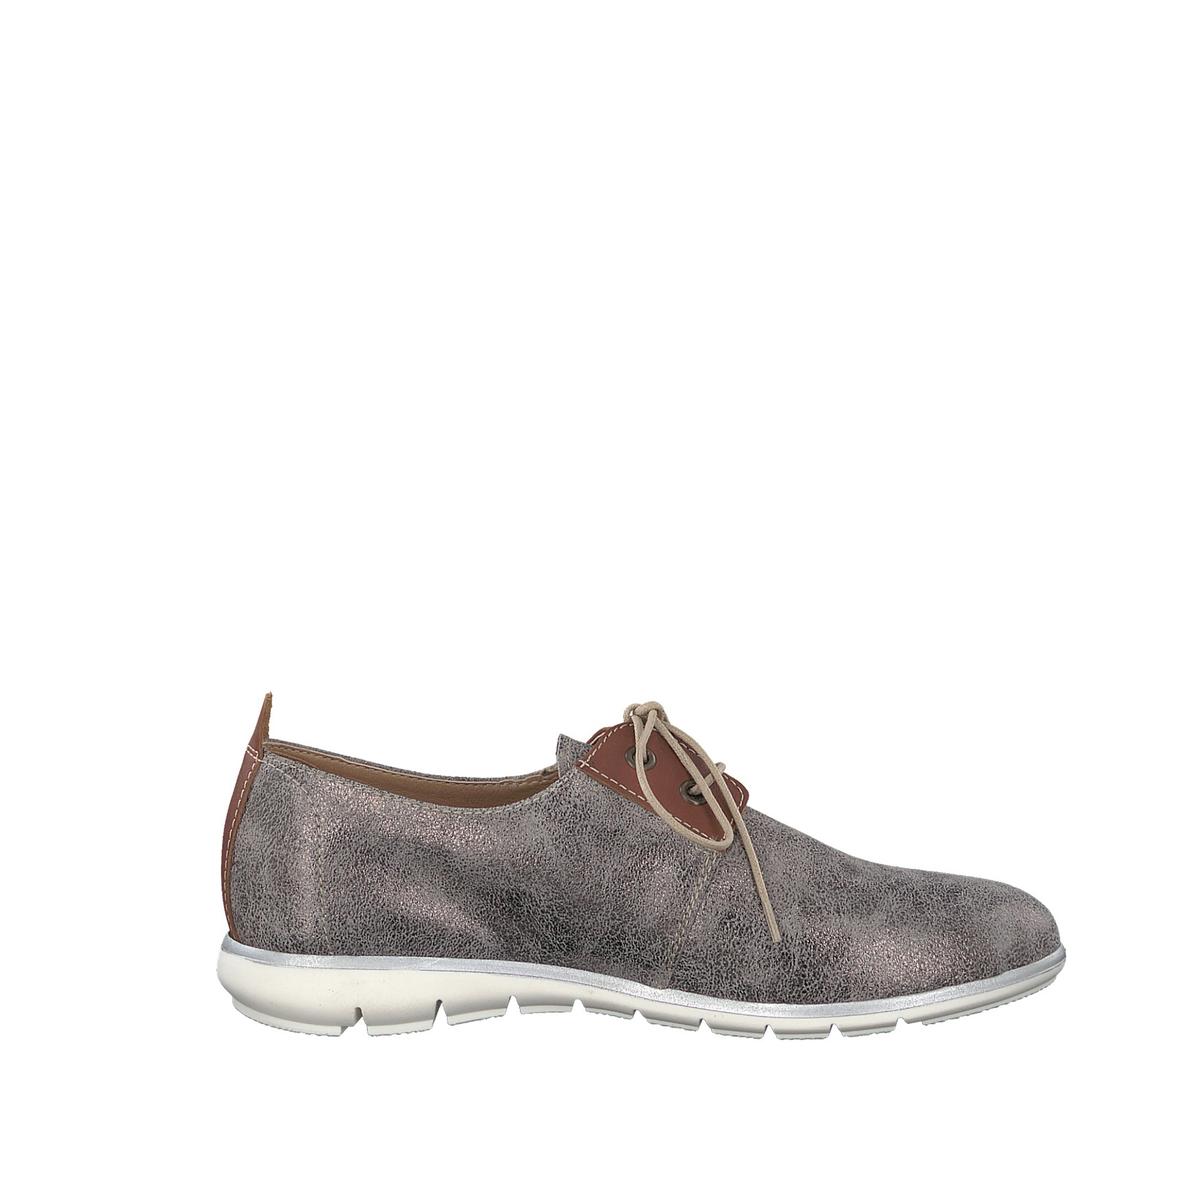 Ботинки-дерби кожаные Cantona цены онлайн